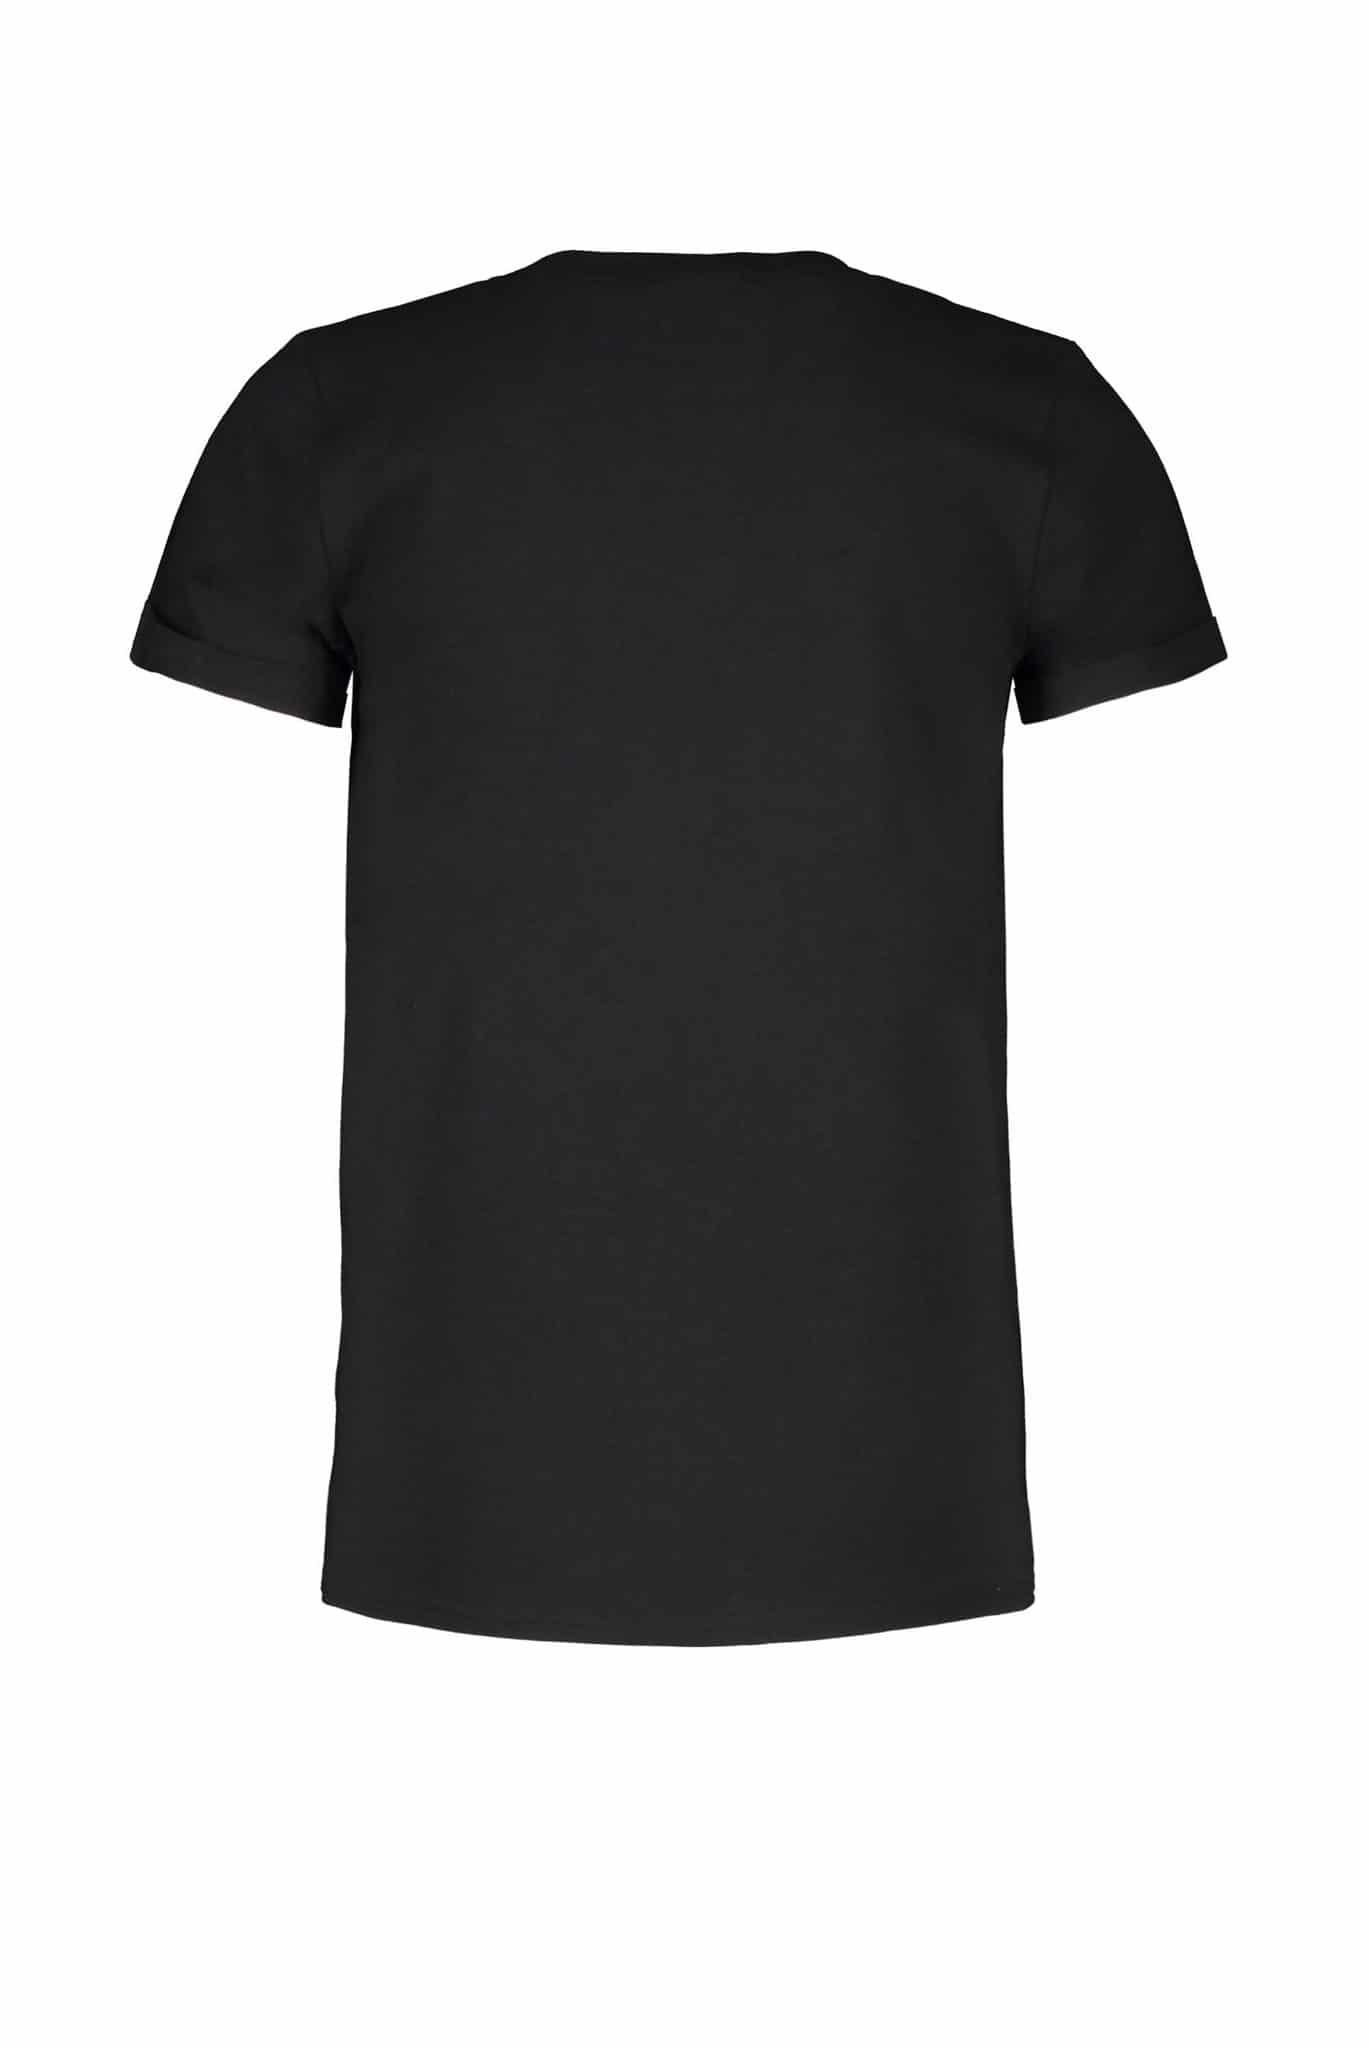 B Nosy B.Yourself T Shirt